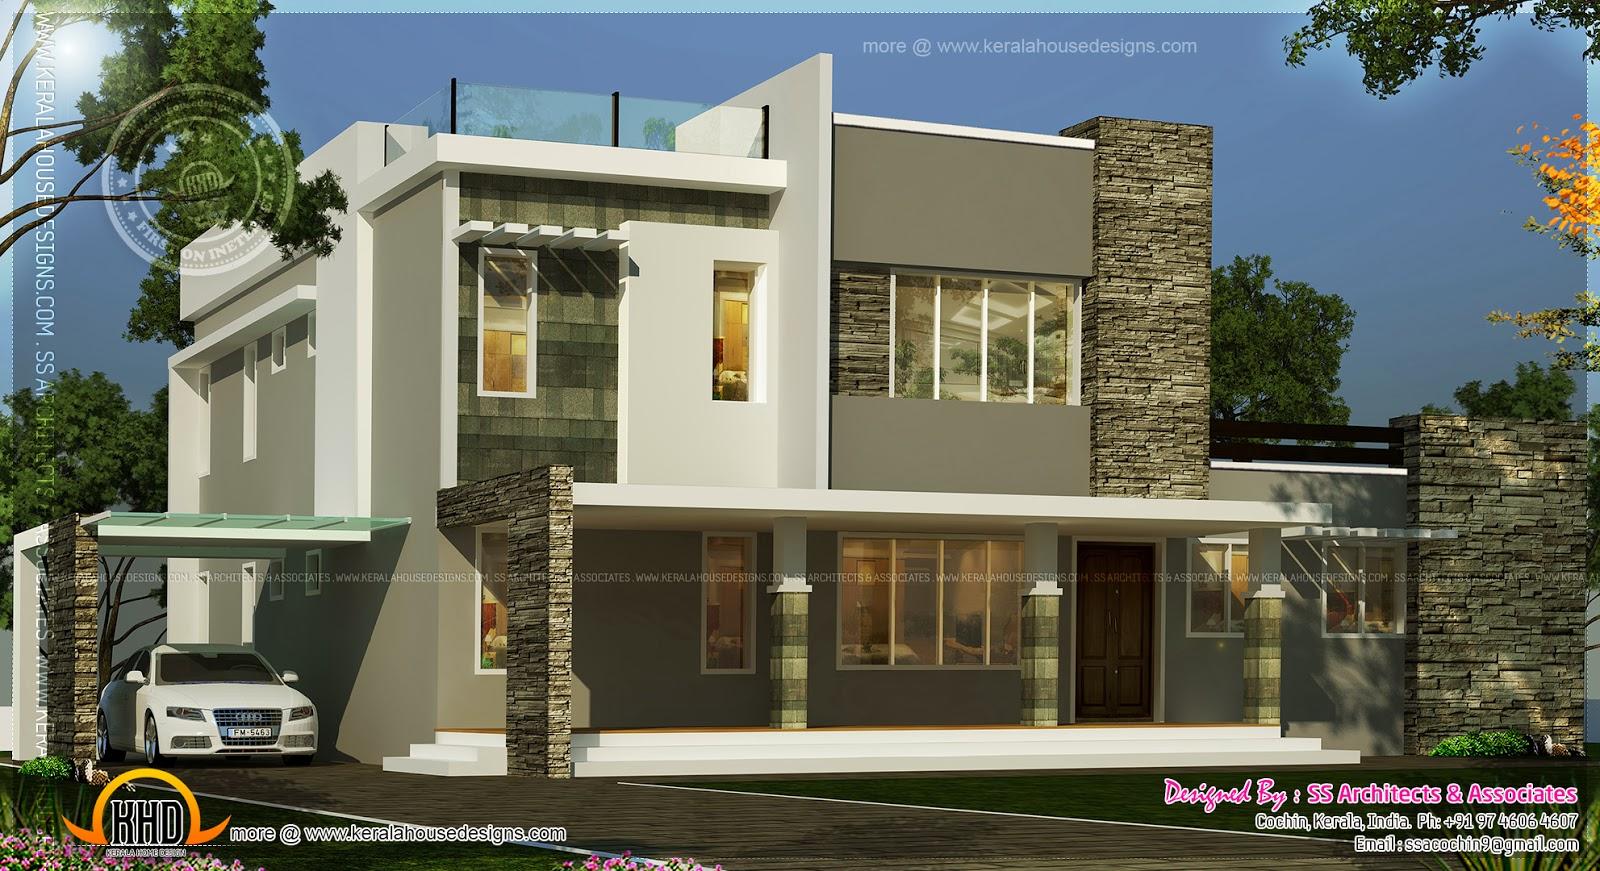 Contemporary flat roof villa plan in 2650 square feet for Contemporary villa